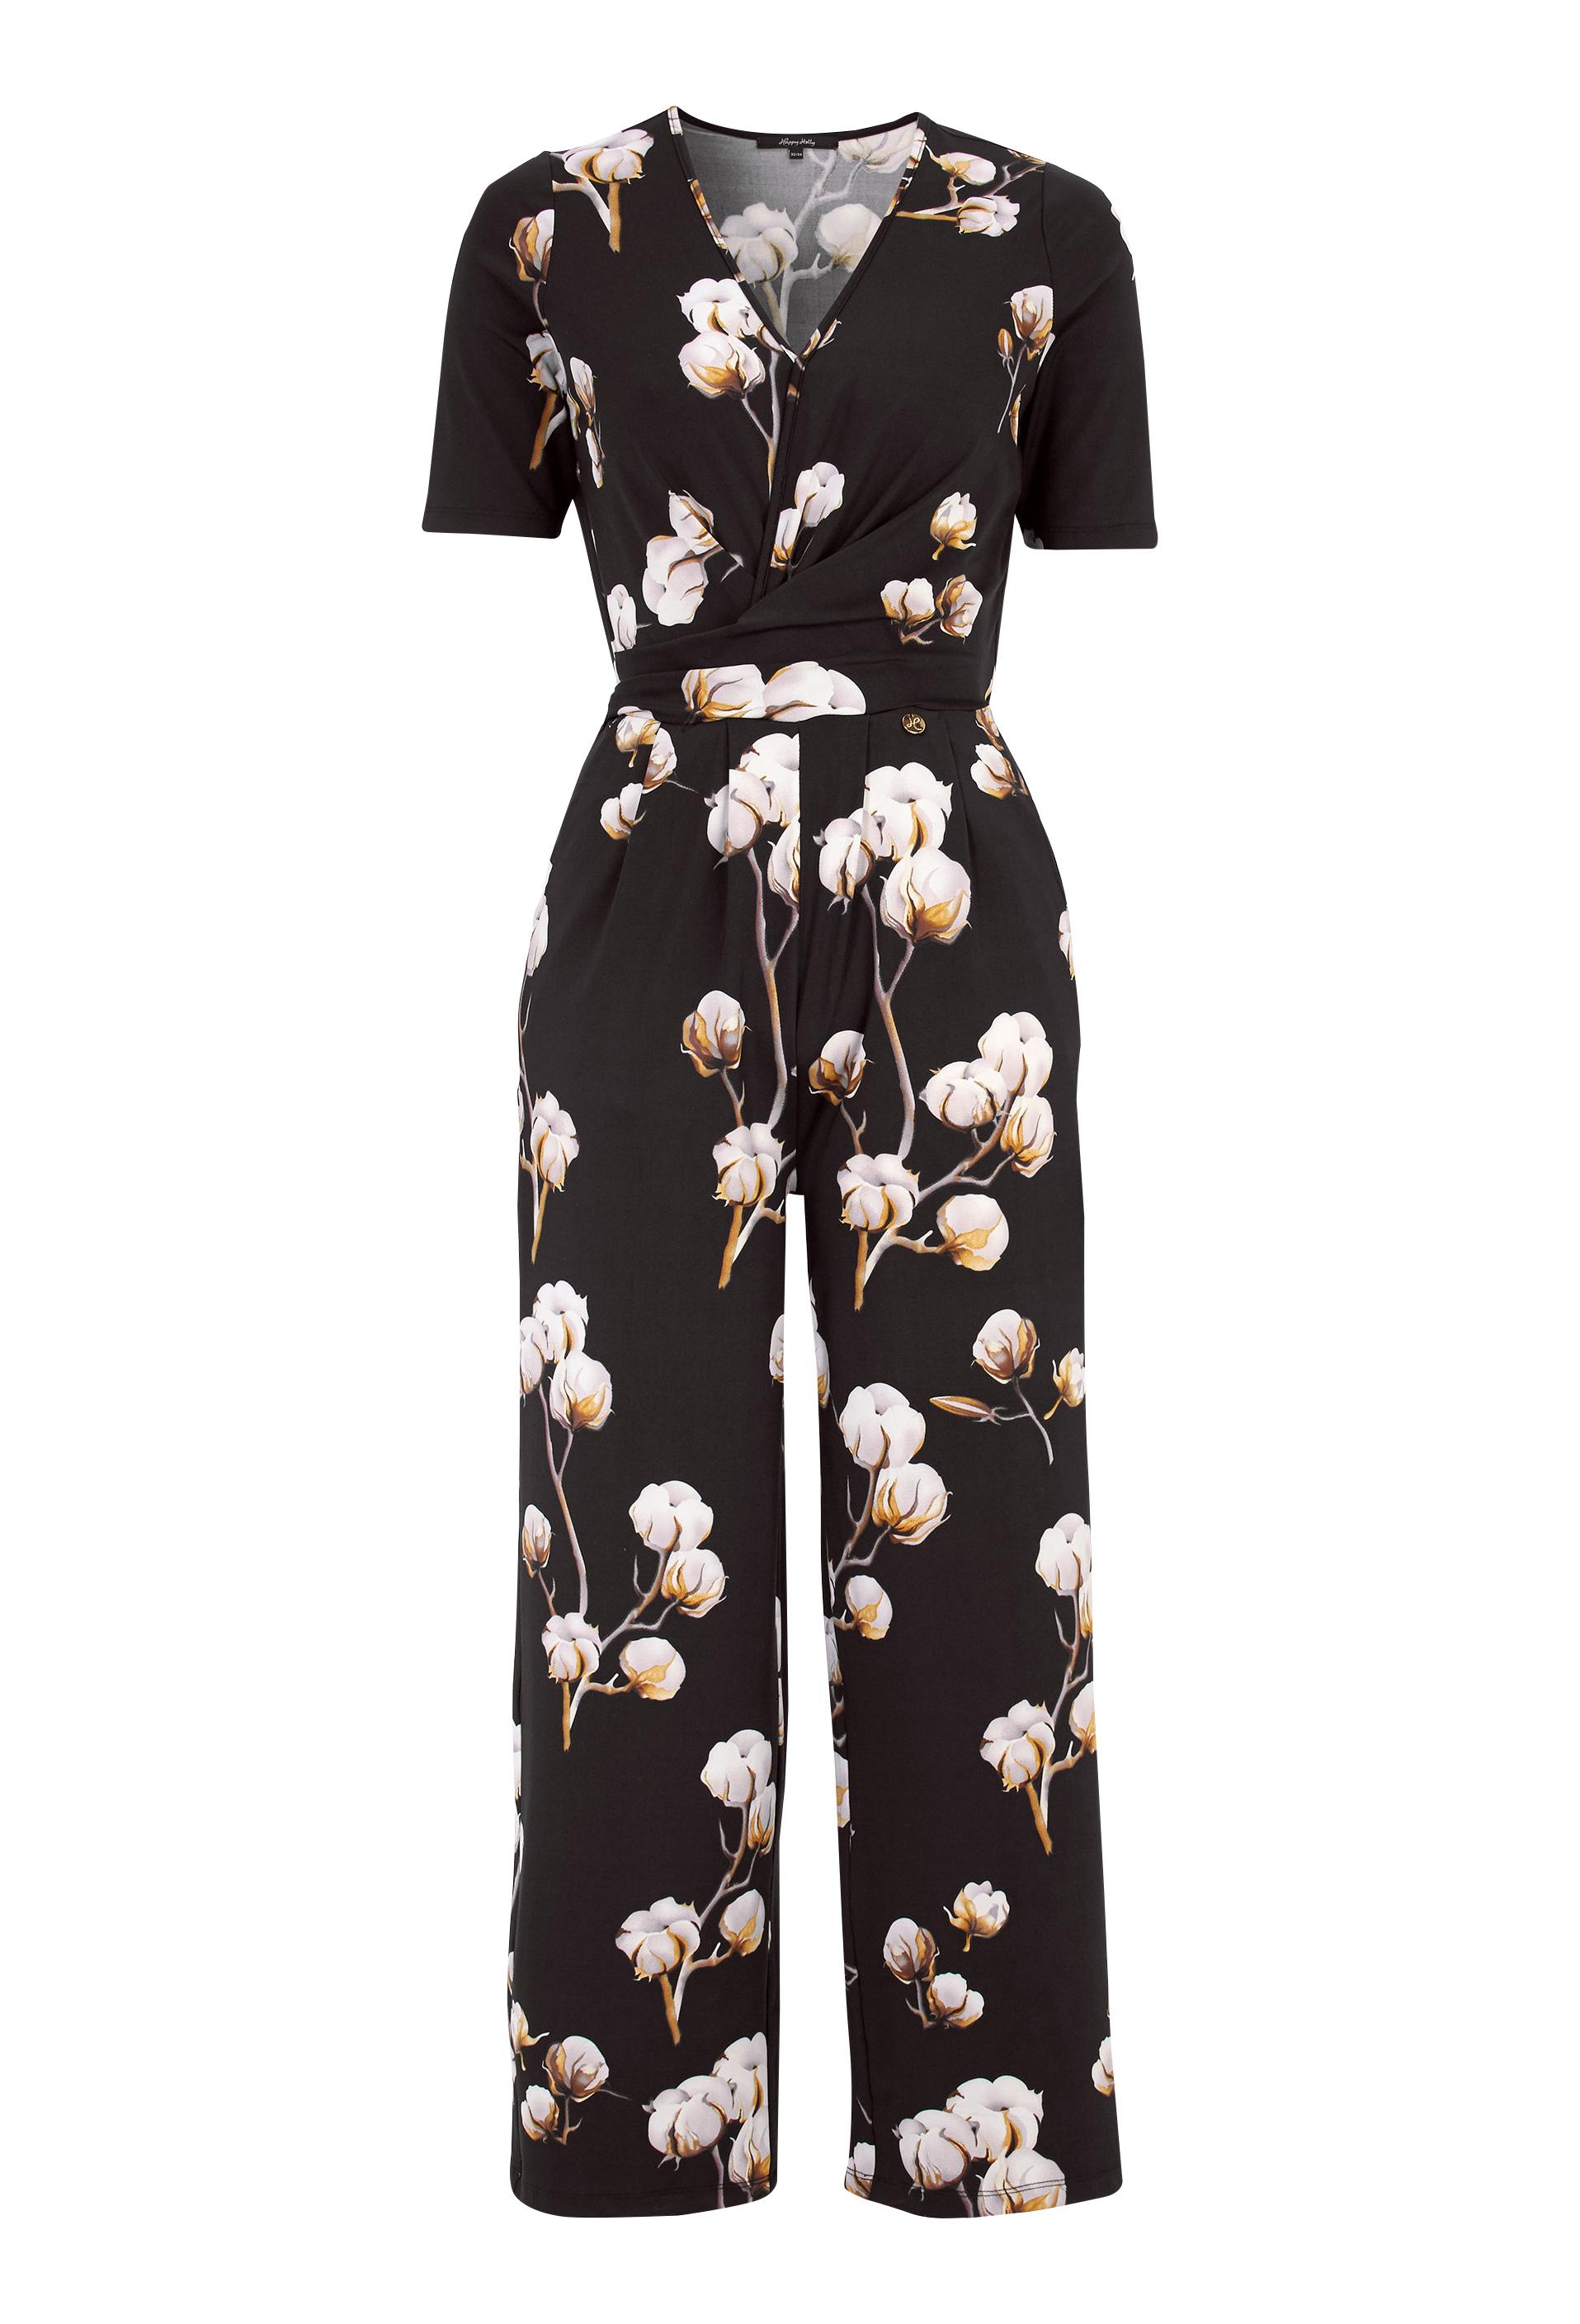 b0444a327c21 Happy Holly Iman ss jumpsuit Black   Patterned - Bubbleroom